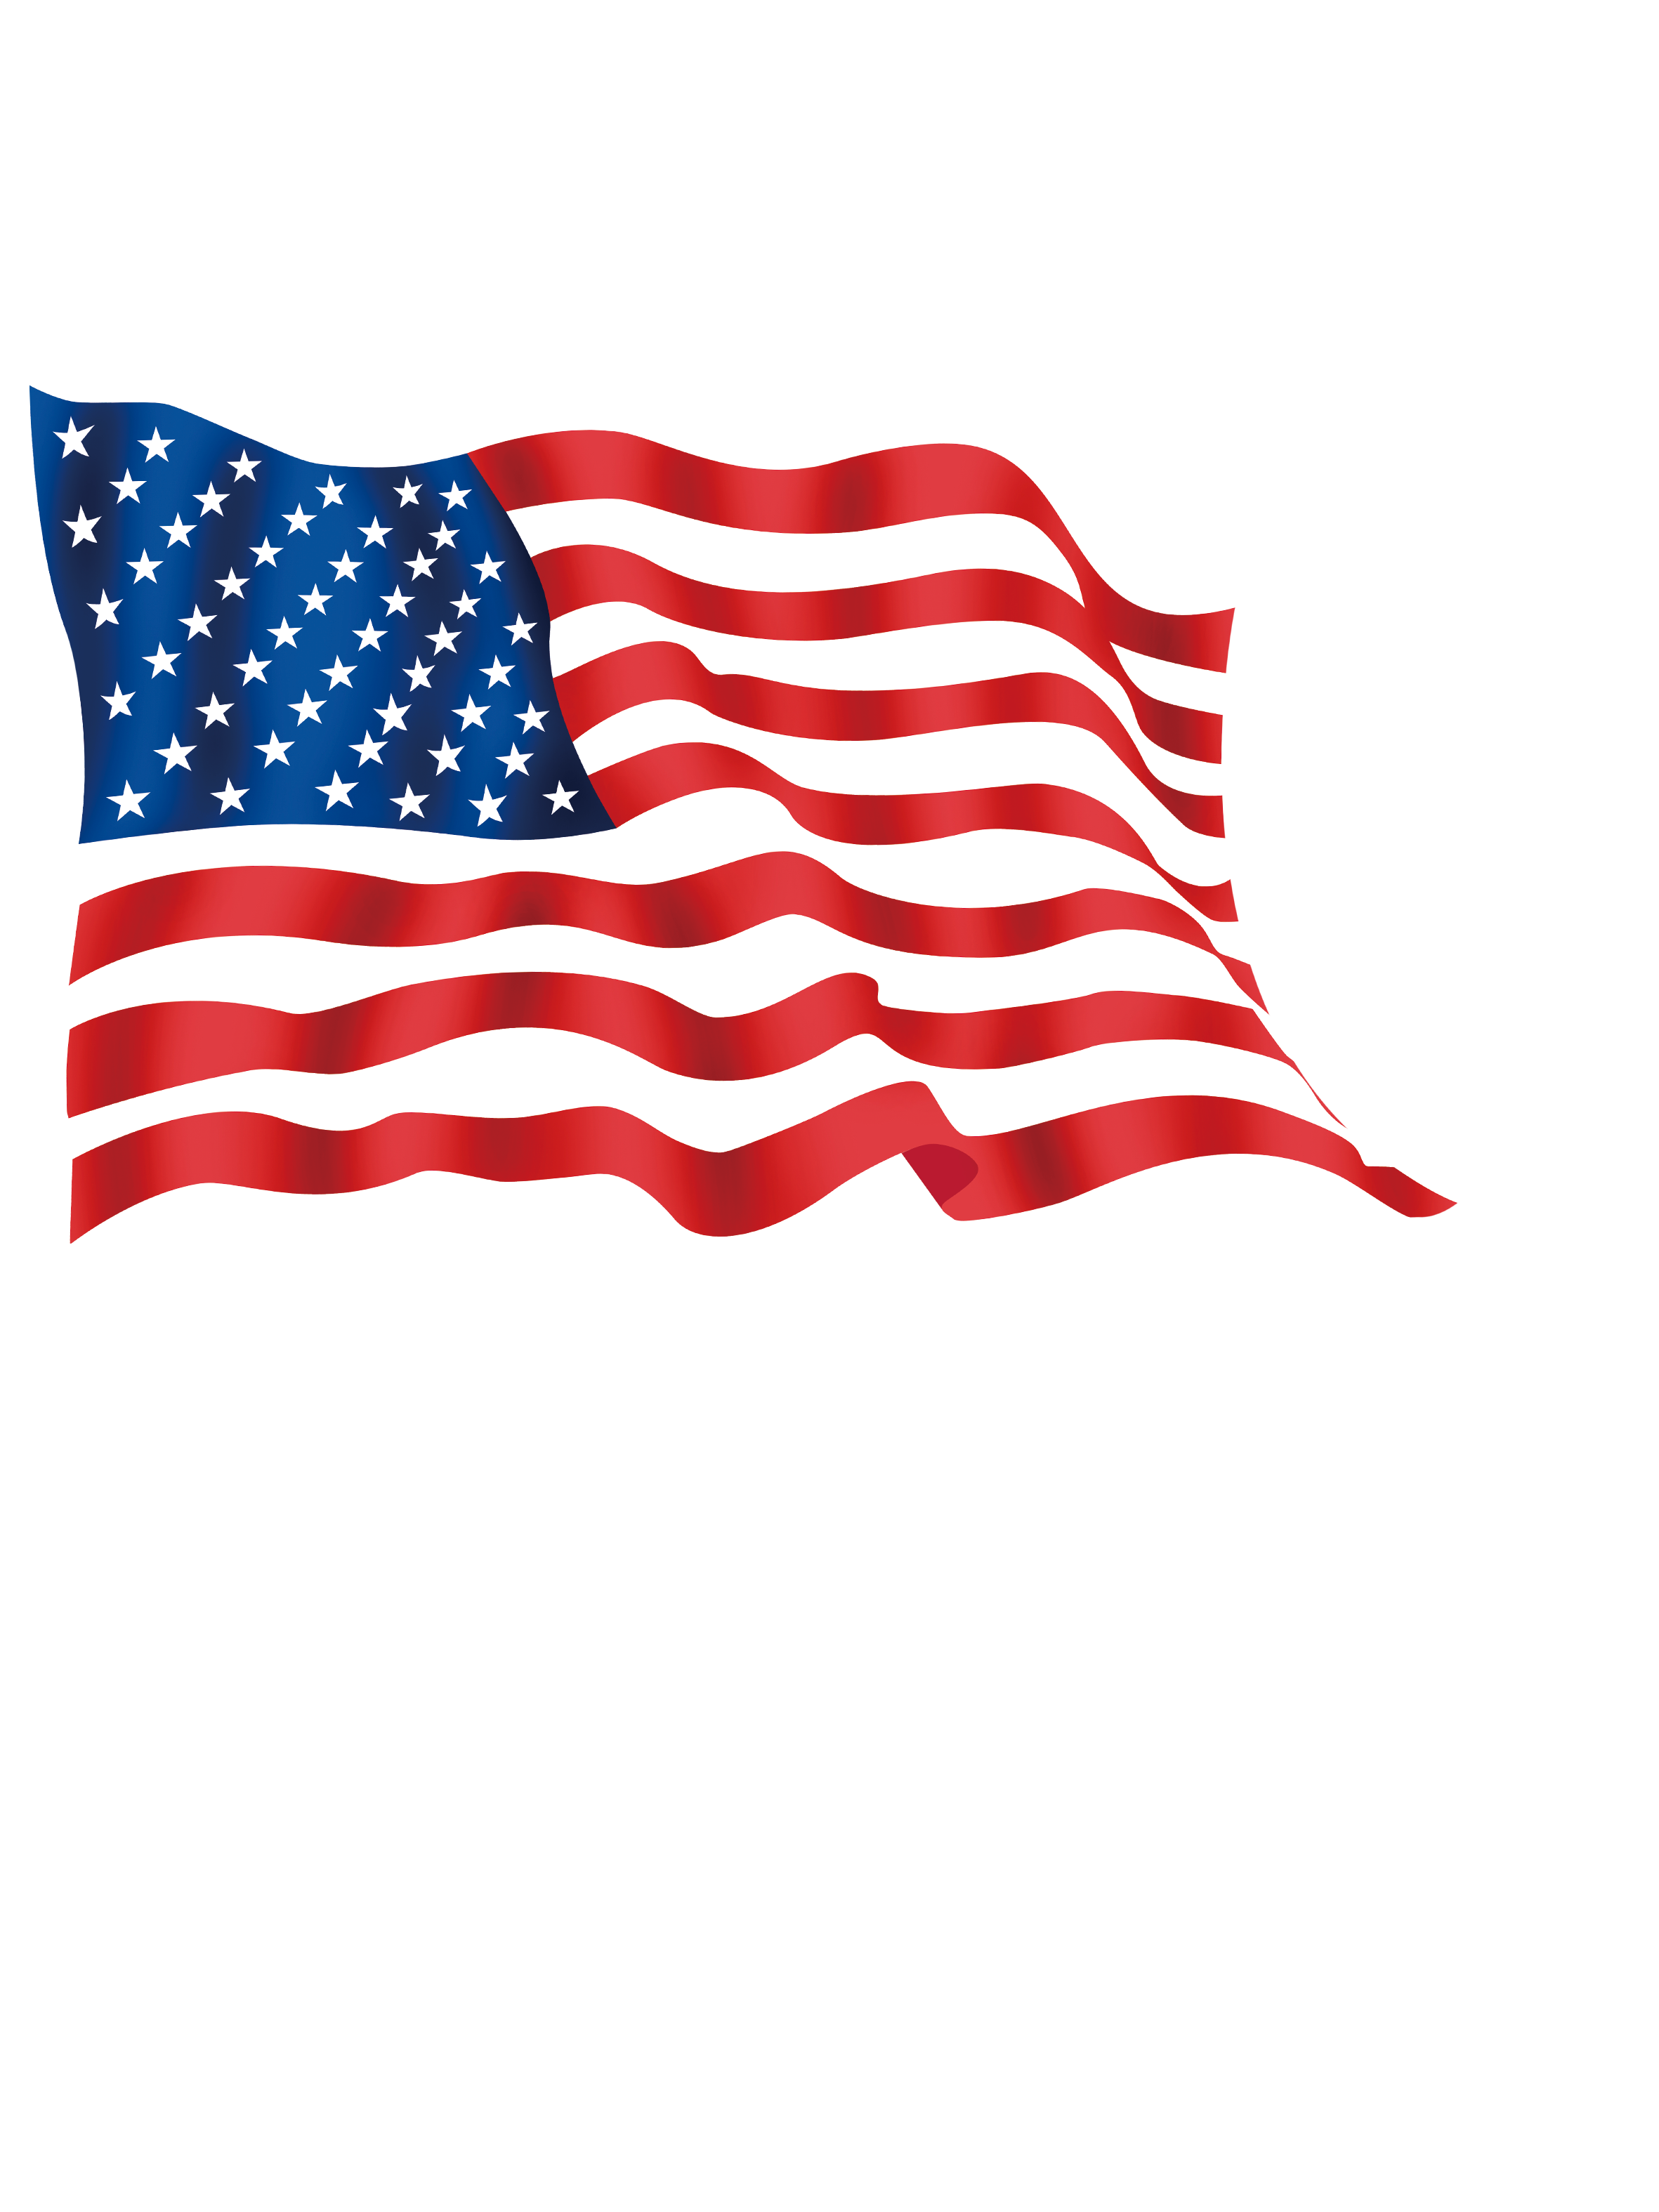 United states president chalk clipart svg transparent stock Flag of the United States Clip art - American flag png ... svg transparent stock